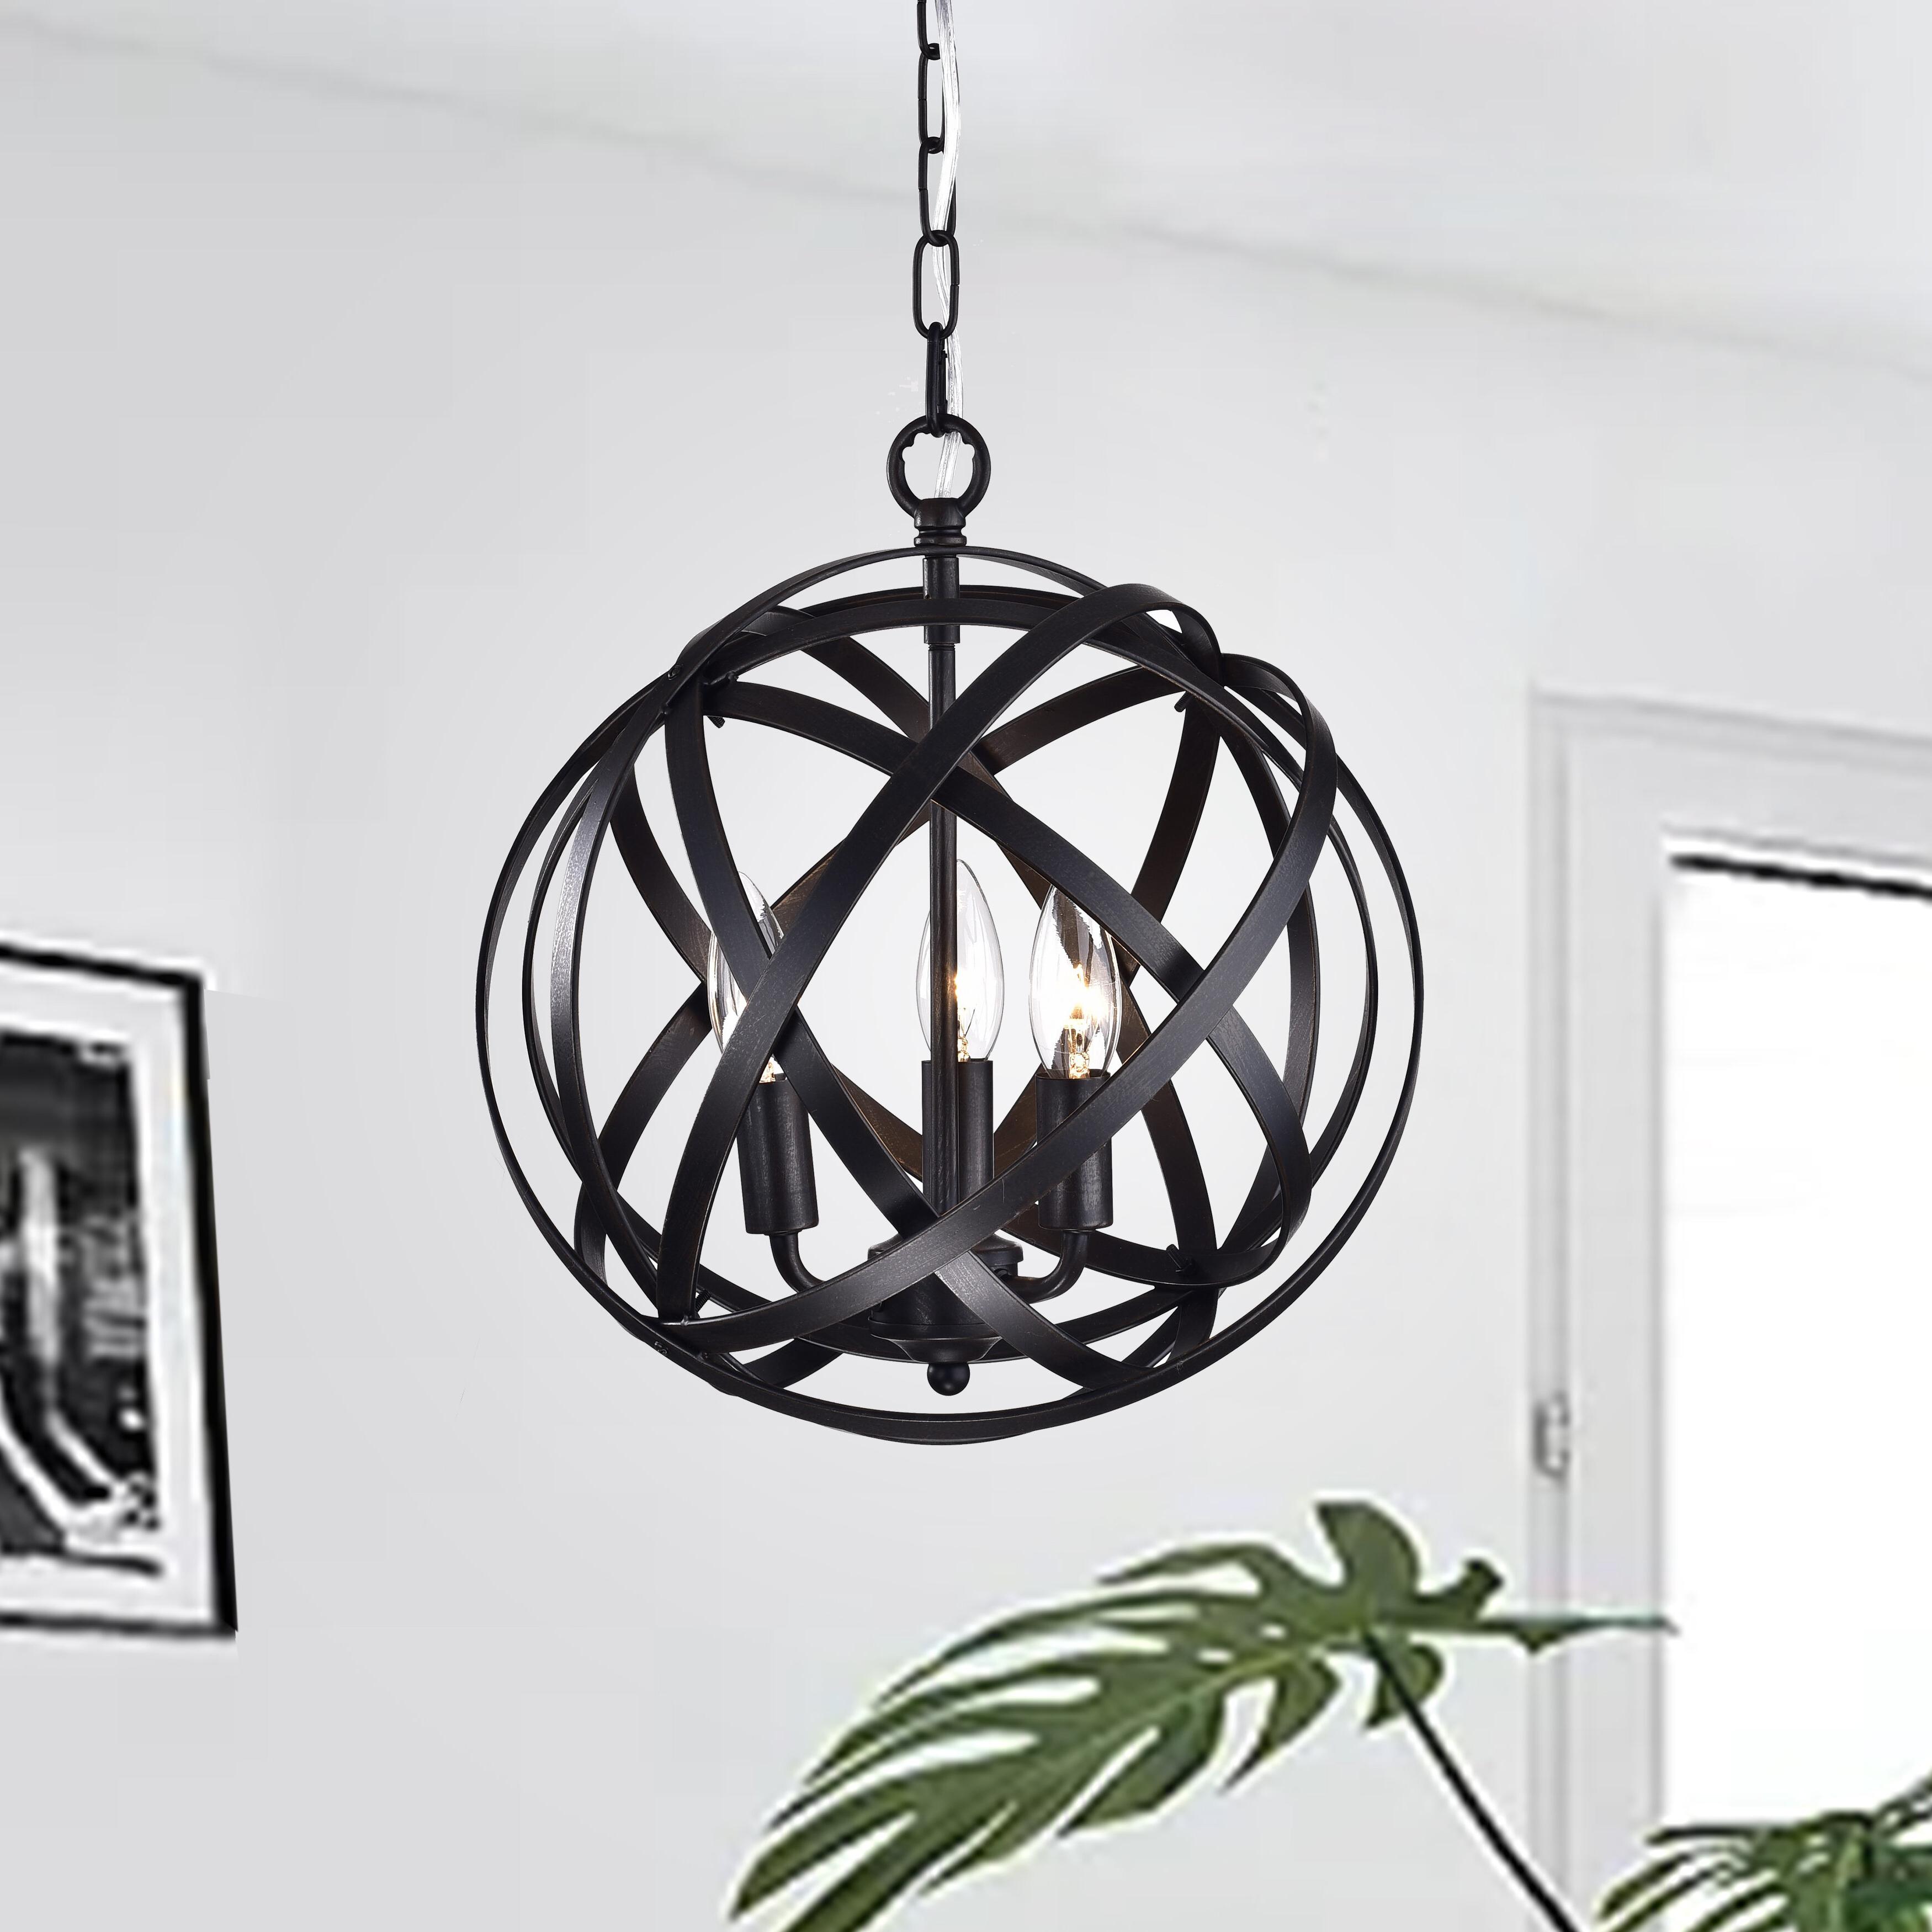 Famous Verlene Foyer 5 Light Globe Chandeliers In Nilsa 3 Light Globe Chandelier & Reviews (View 19 of 25)